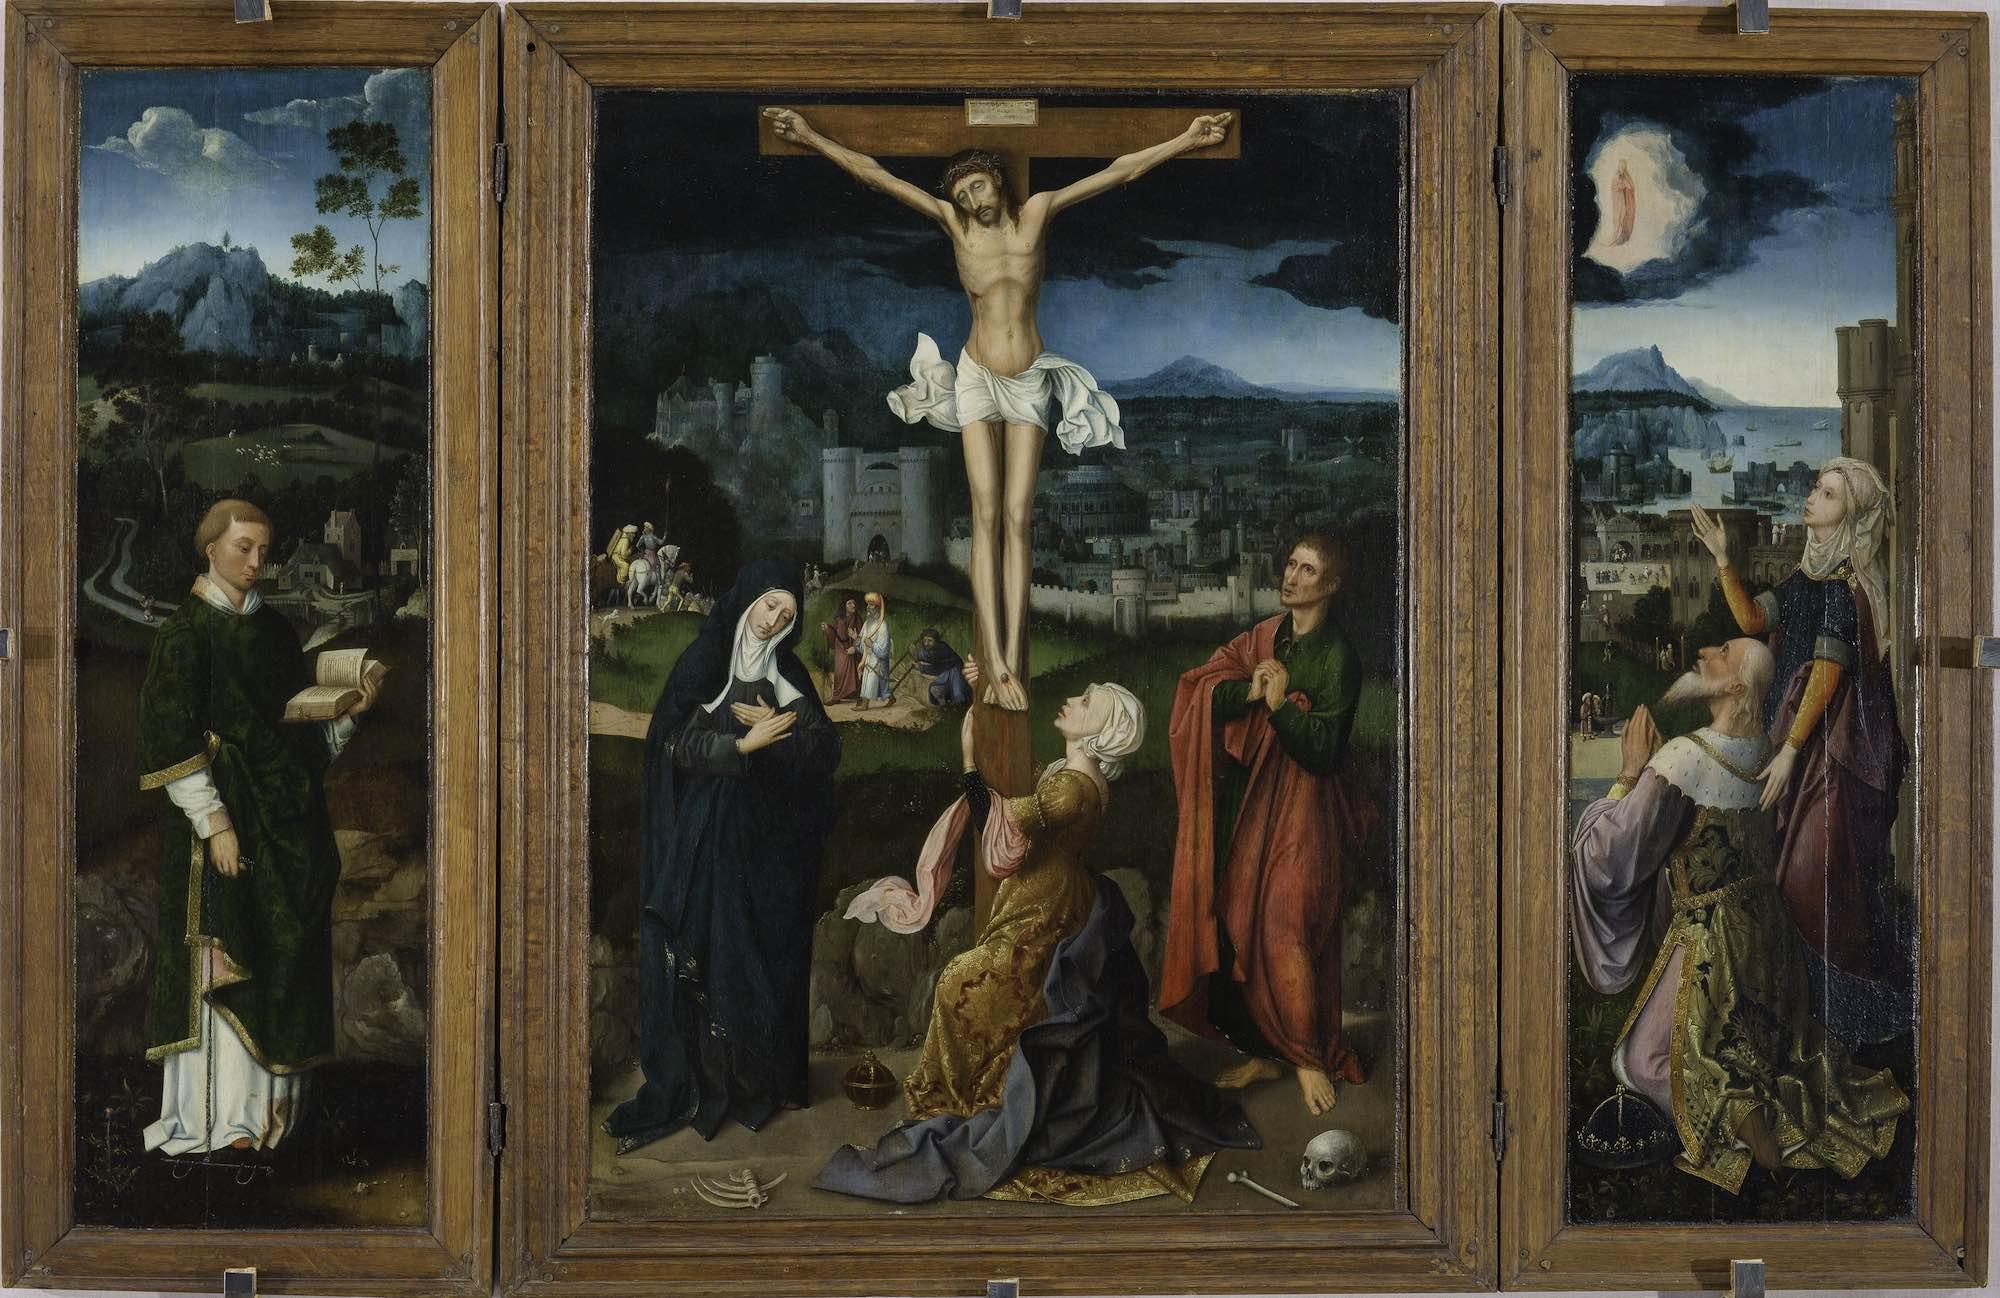 Crucifixion 1500-20-Atelier-de-Joachim-Patinir-coll-priv